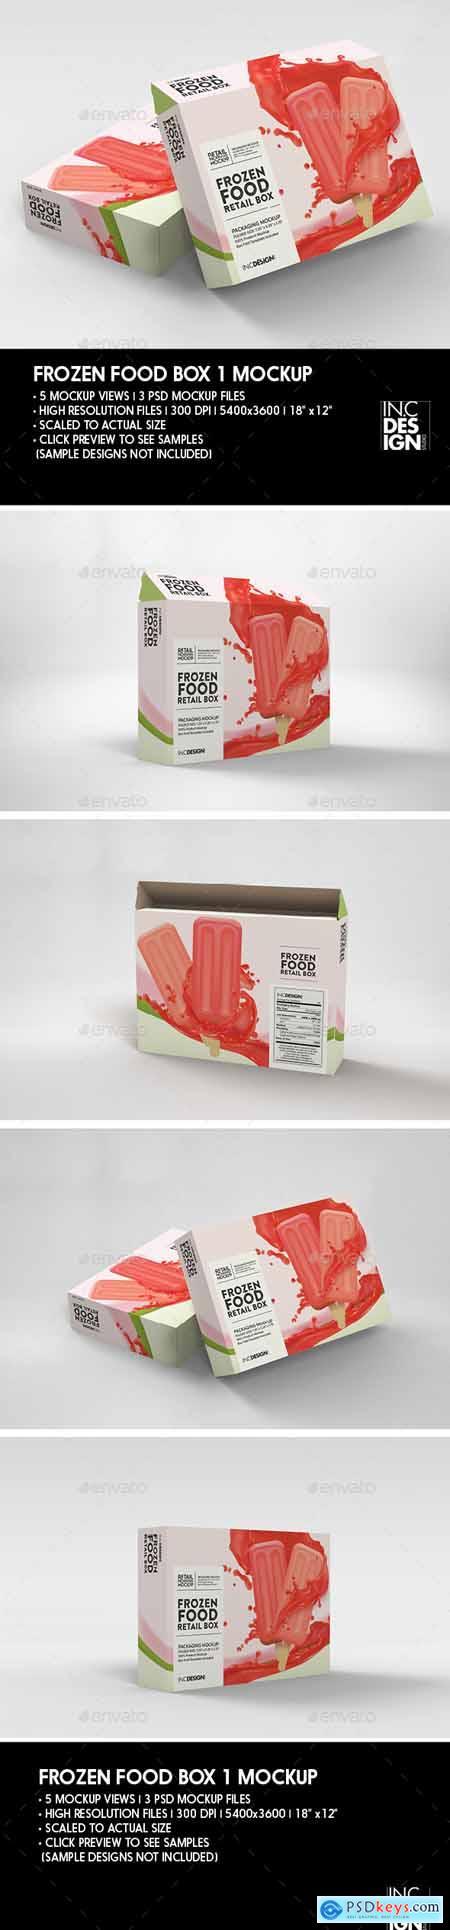 Thin Frozen Food Box Packaging Mockup 29888168